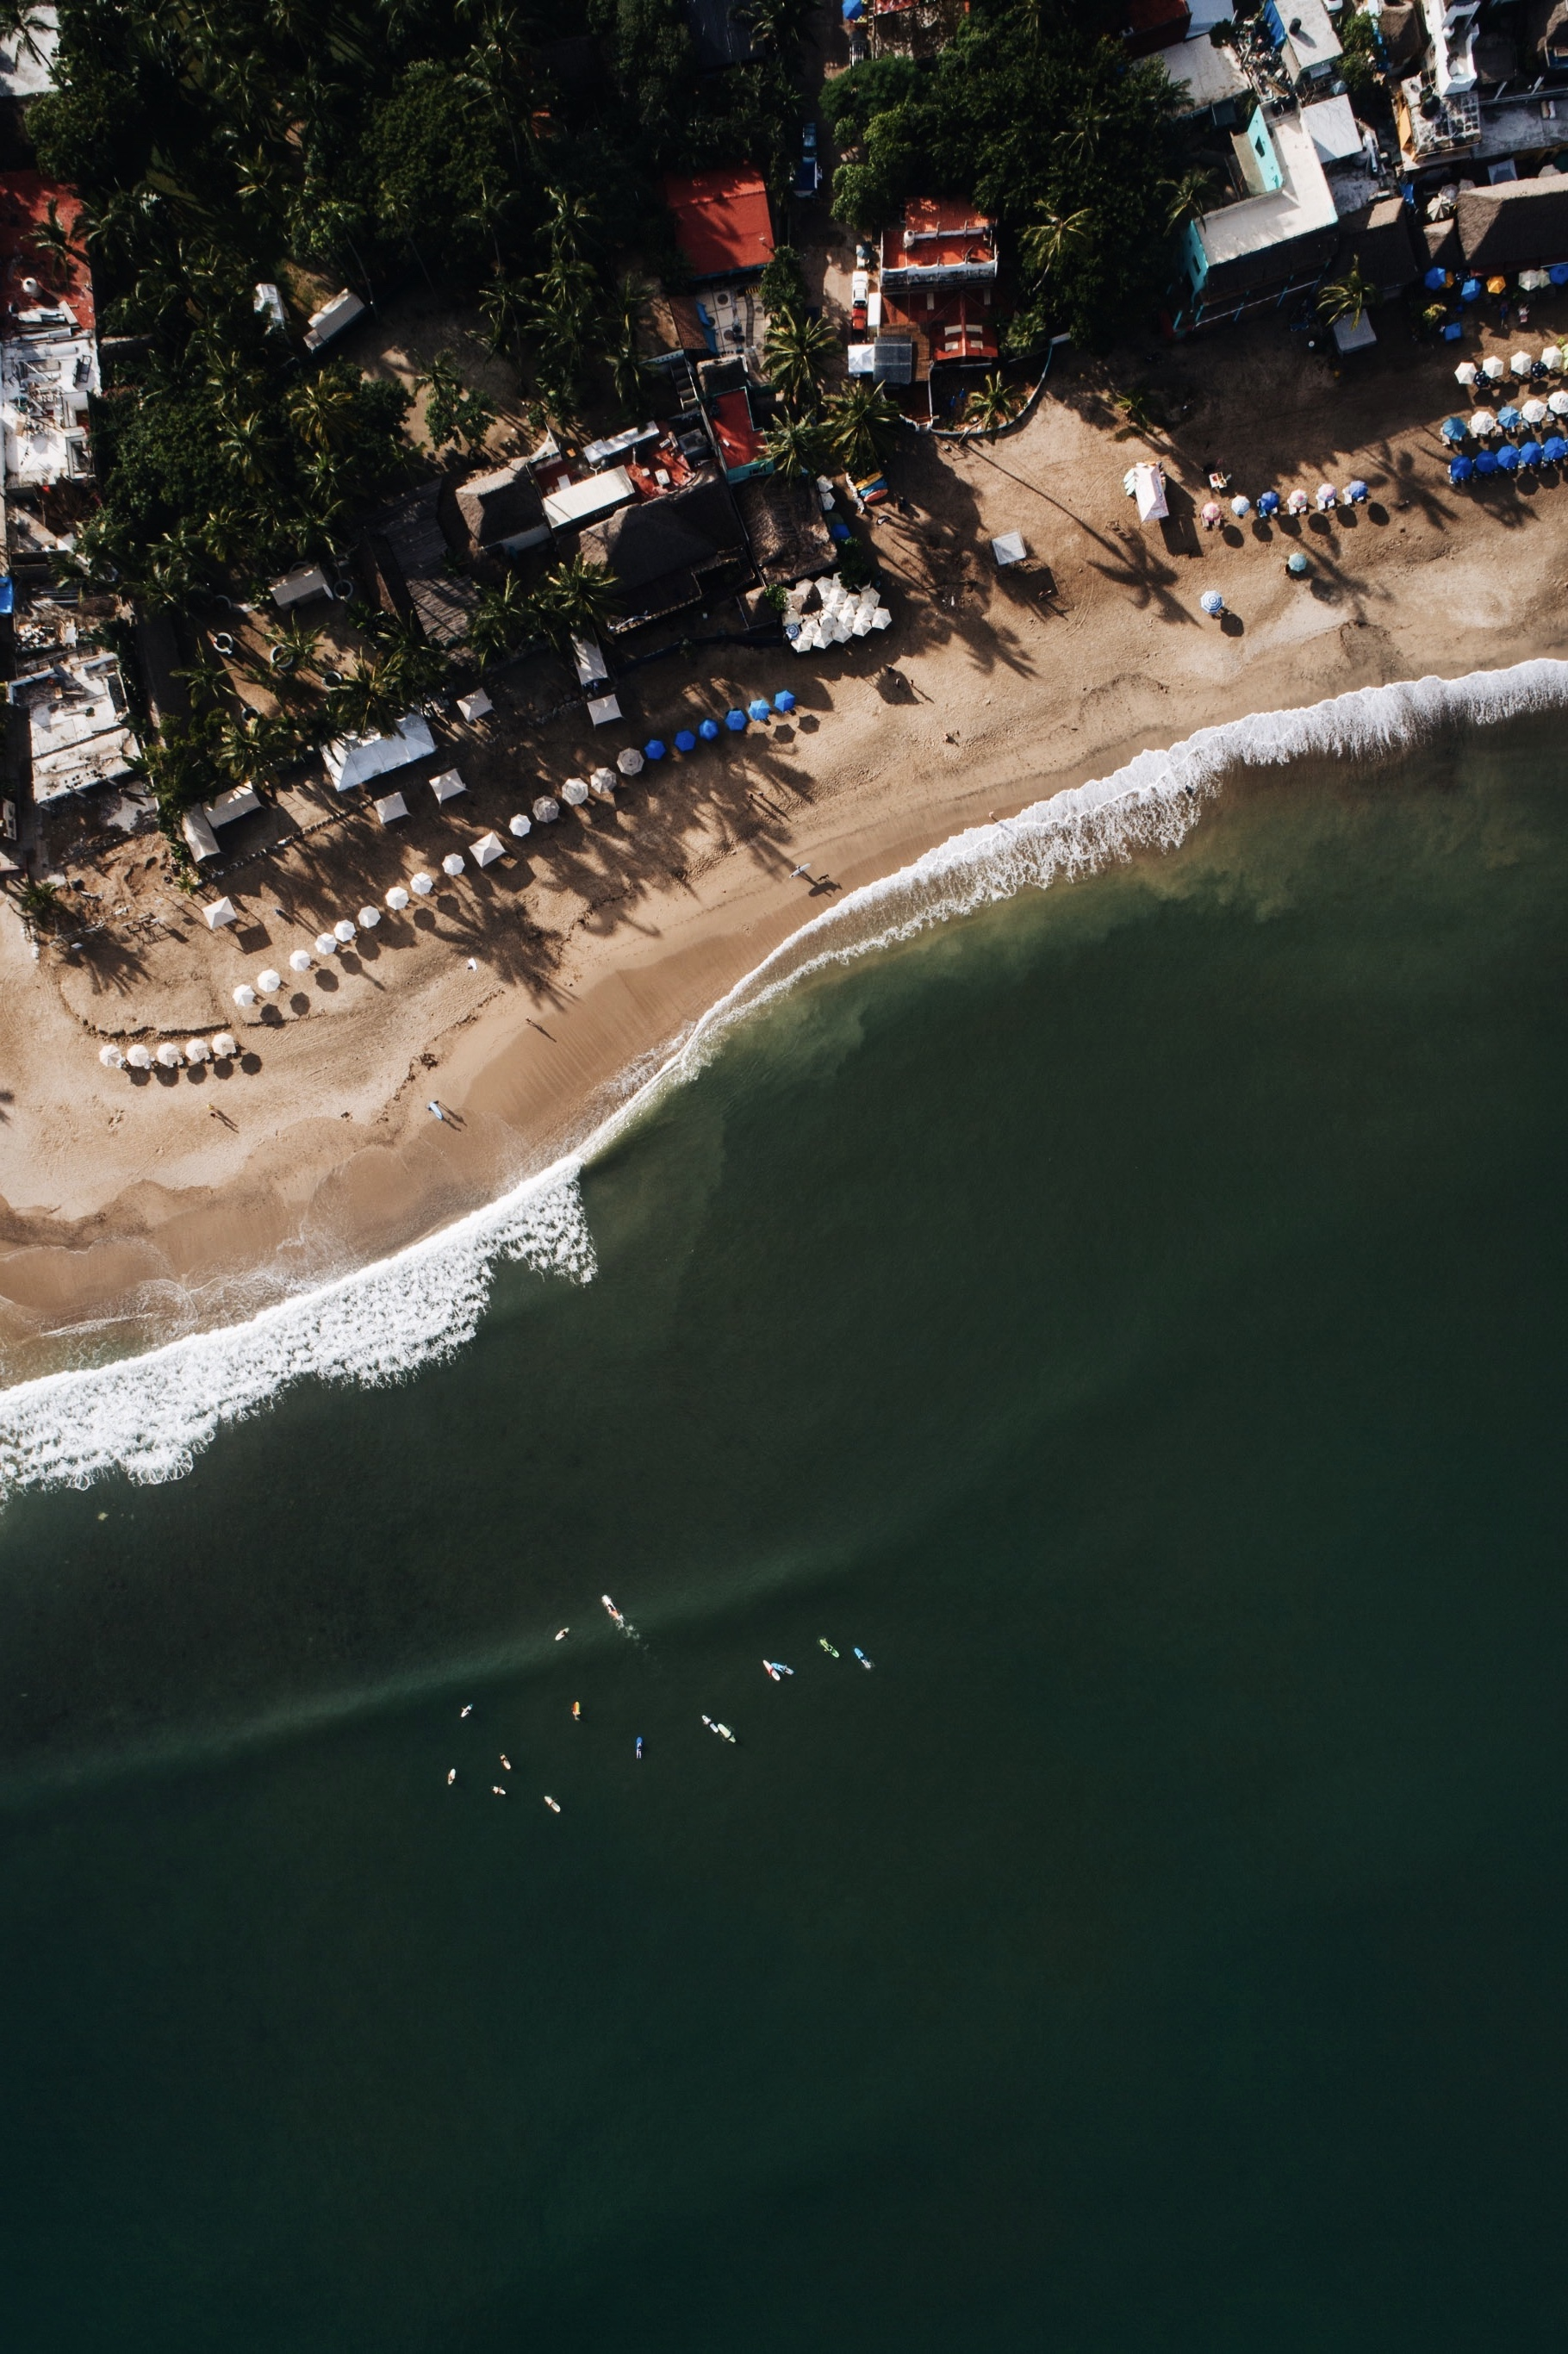 Tristan-Guibald-Surf-México-Sayulita-Pascuales-Zihuatanejo-Fotografía-Heiko-Bothe-14.jpg